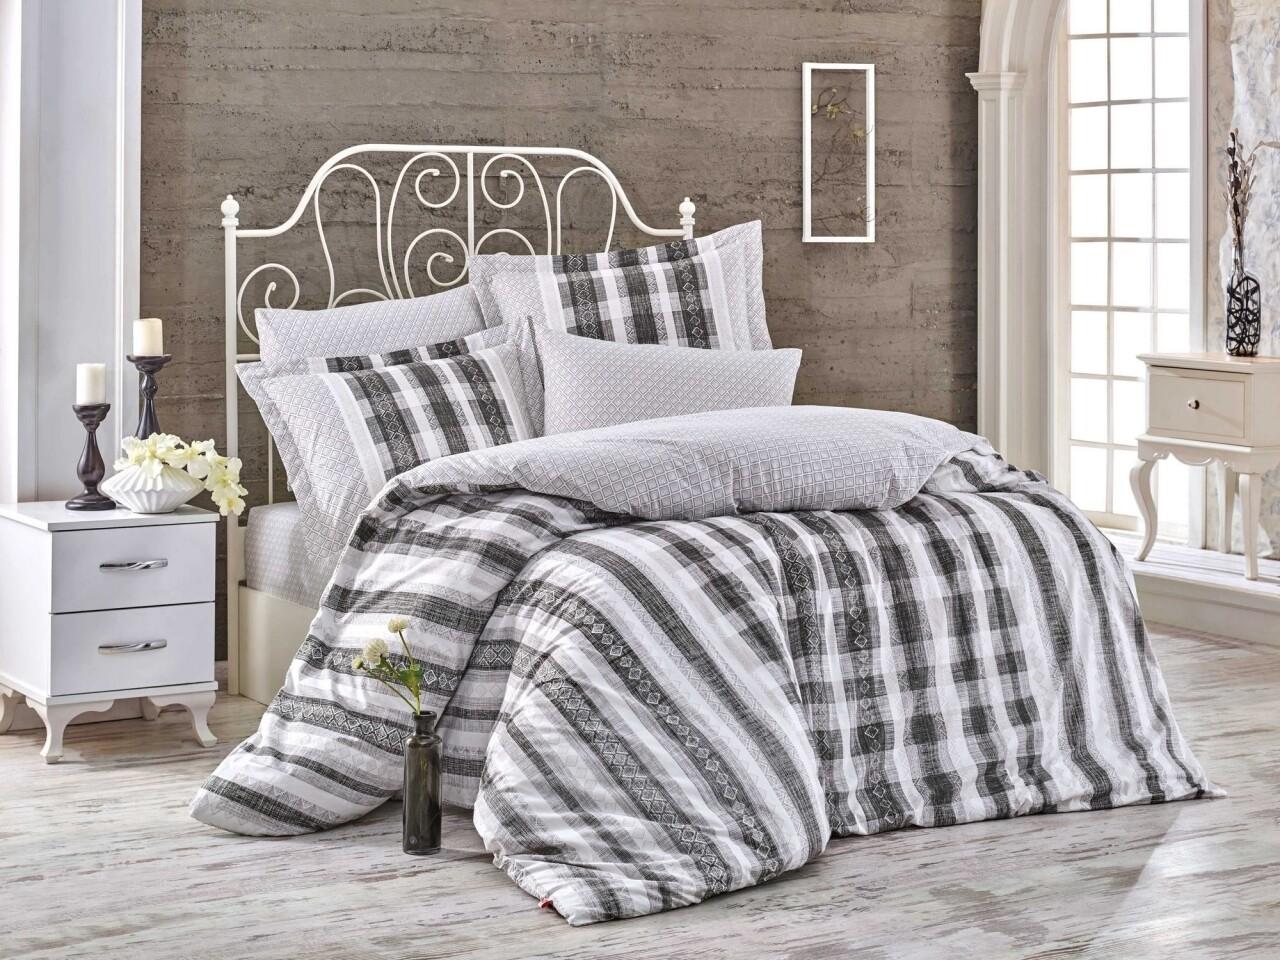 Lenjerie de pat pentru o persoana, 3 piese, 100% bumbac poplin, Hobby, Debora, alb/negru